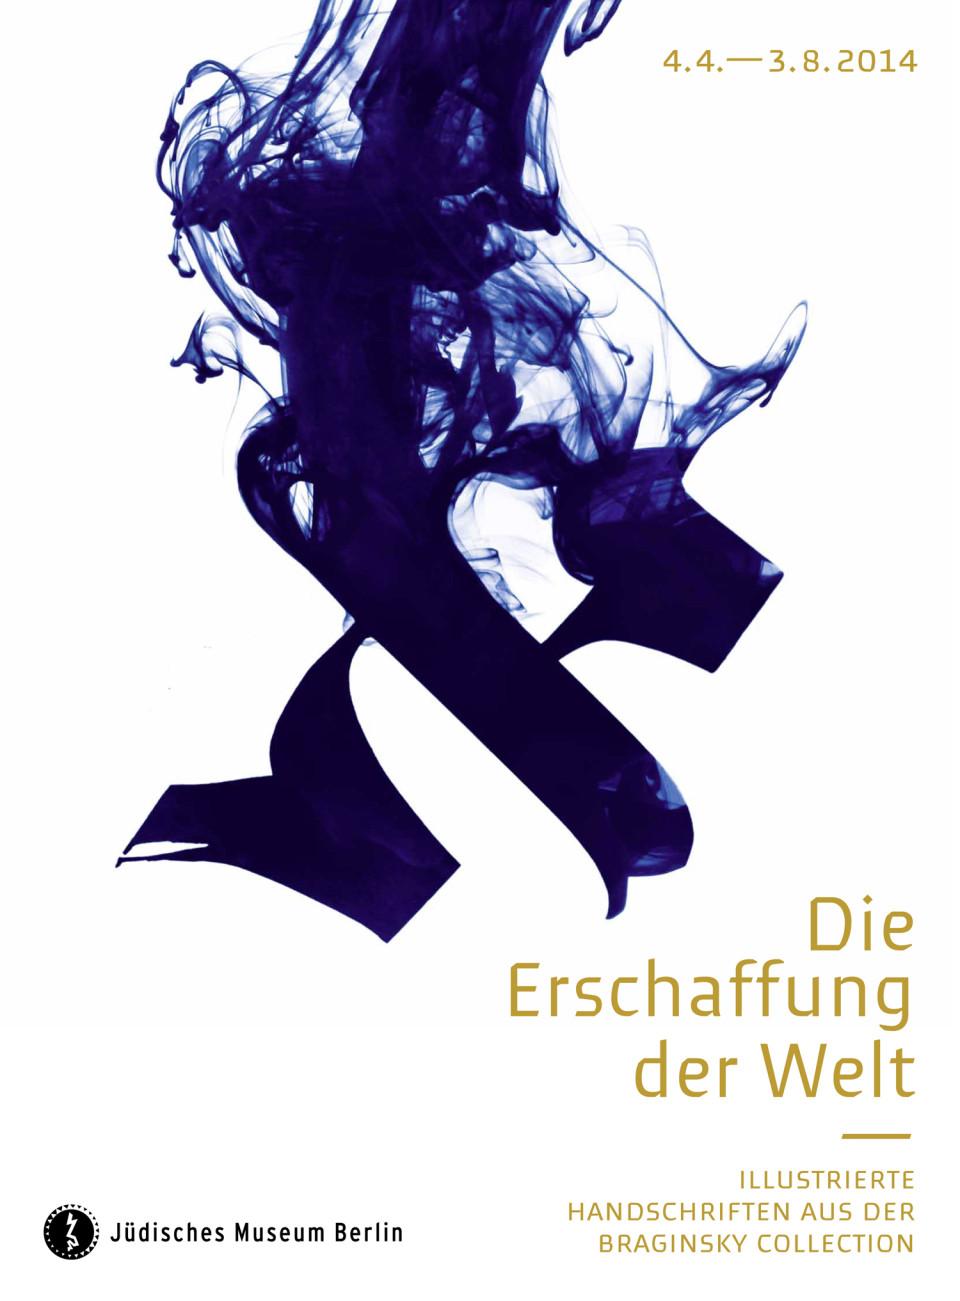 Die Erschaffung der Welt – Jüdisches Museum Berlin (1)